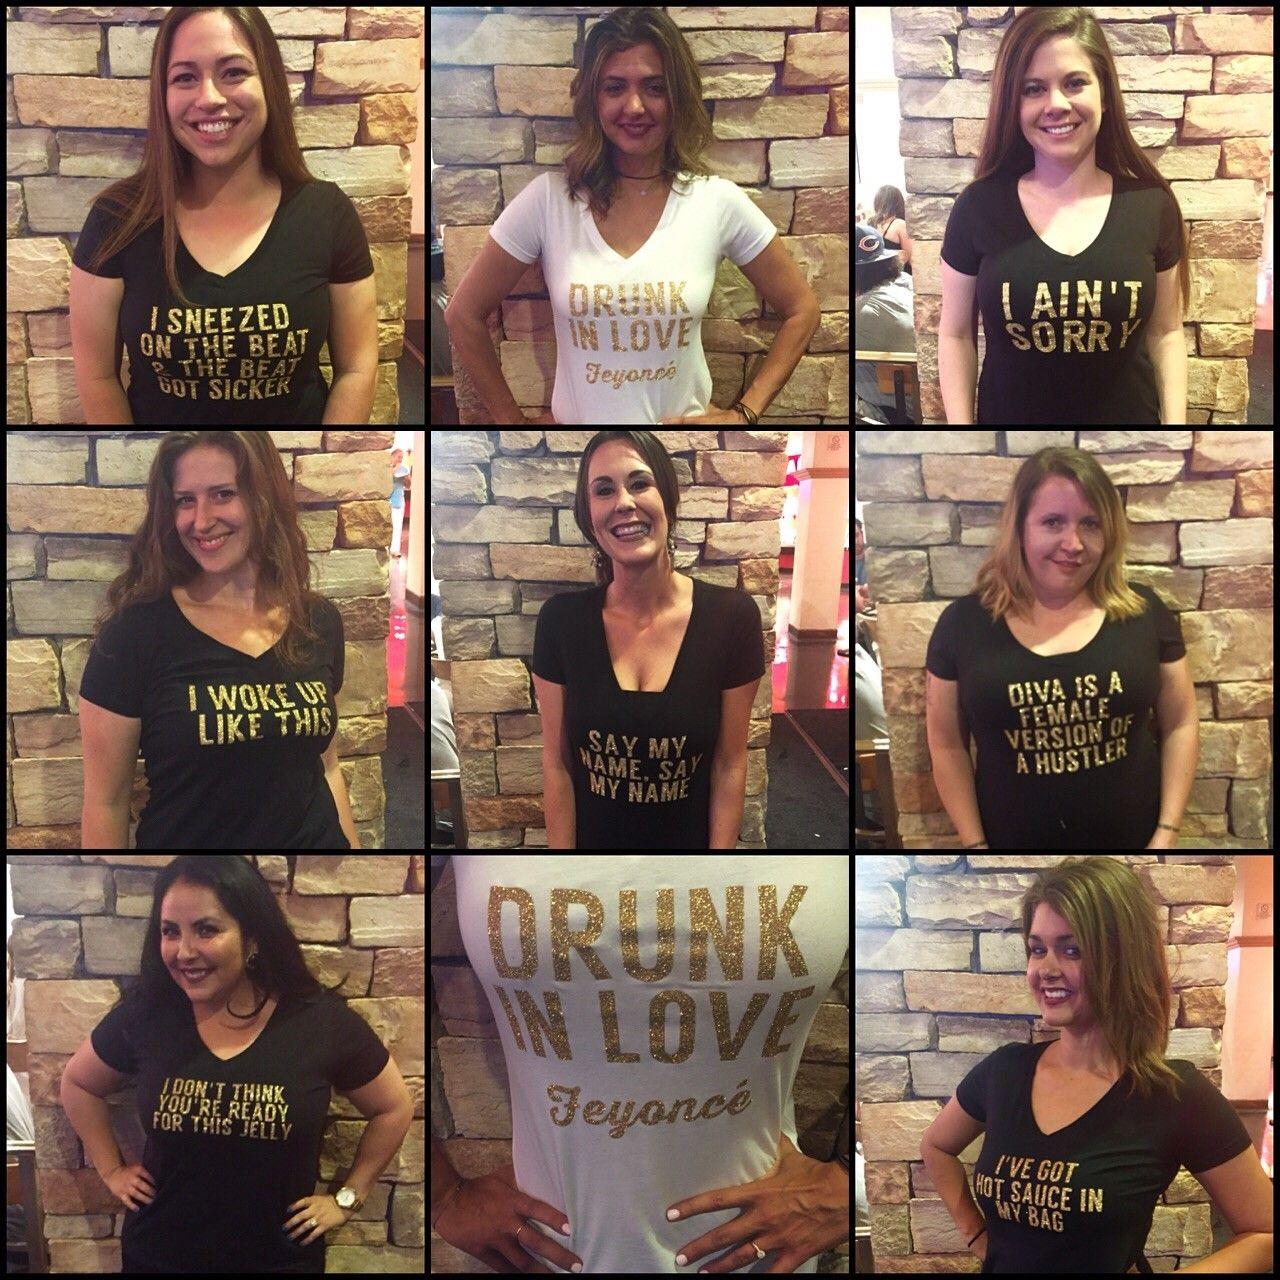 bachelorette party, bachelorette ideas, slay shirts, custom bridesmaid shirt, bachelorette tanks, bridesmaid gifts, bridesmaid movie, bachelorette shirts, funny bridesmaid shirt